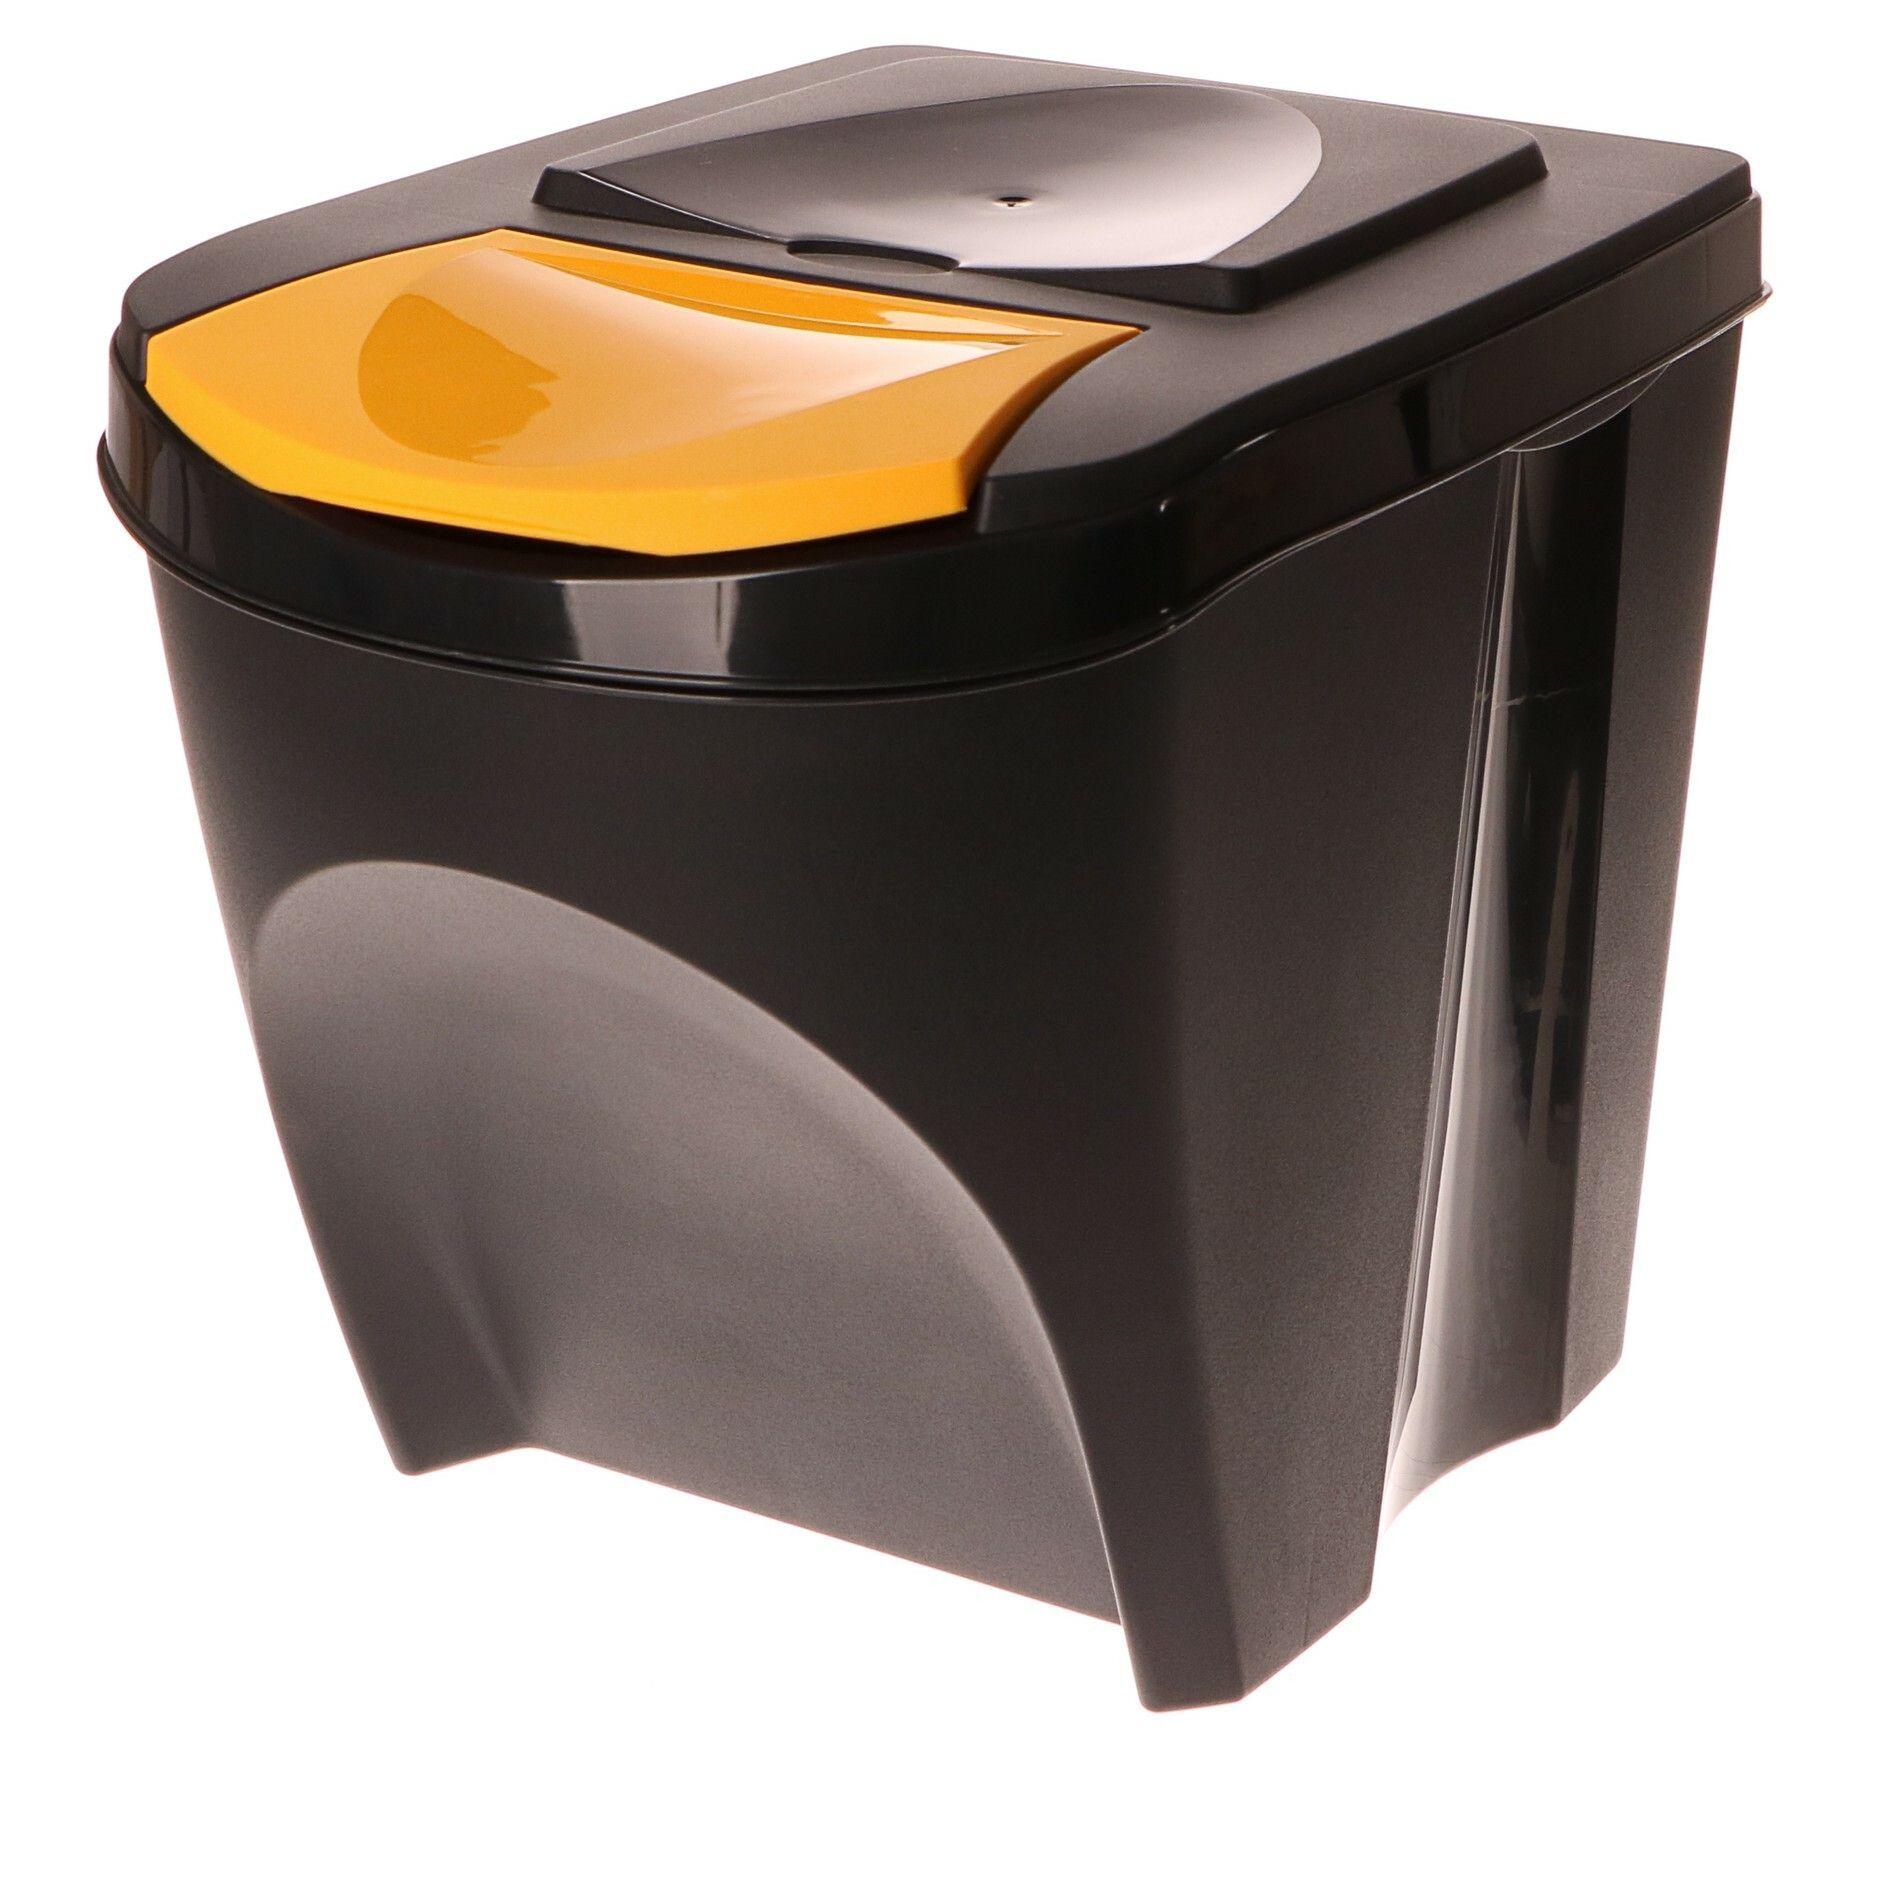 Odpadkový koš na plast SORTIBOX antracit 392X293X335 PROSPERPLAST